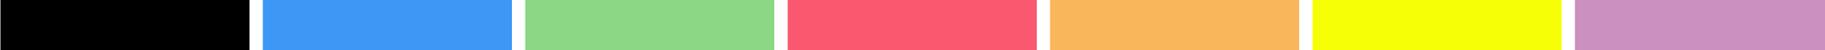 EUedge-colors